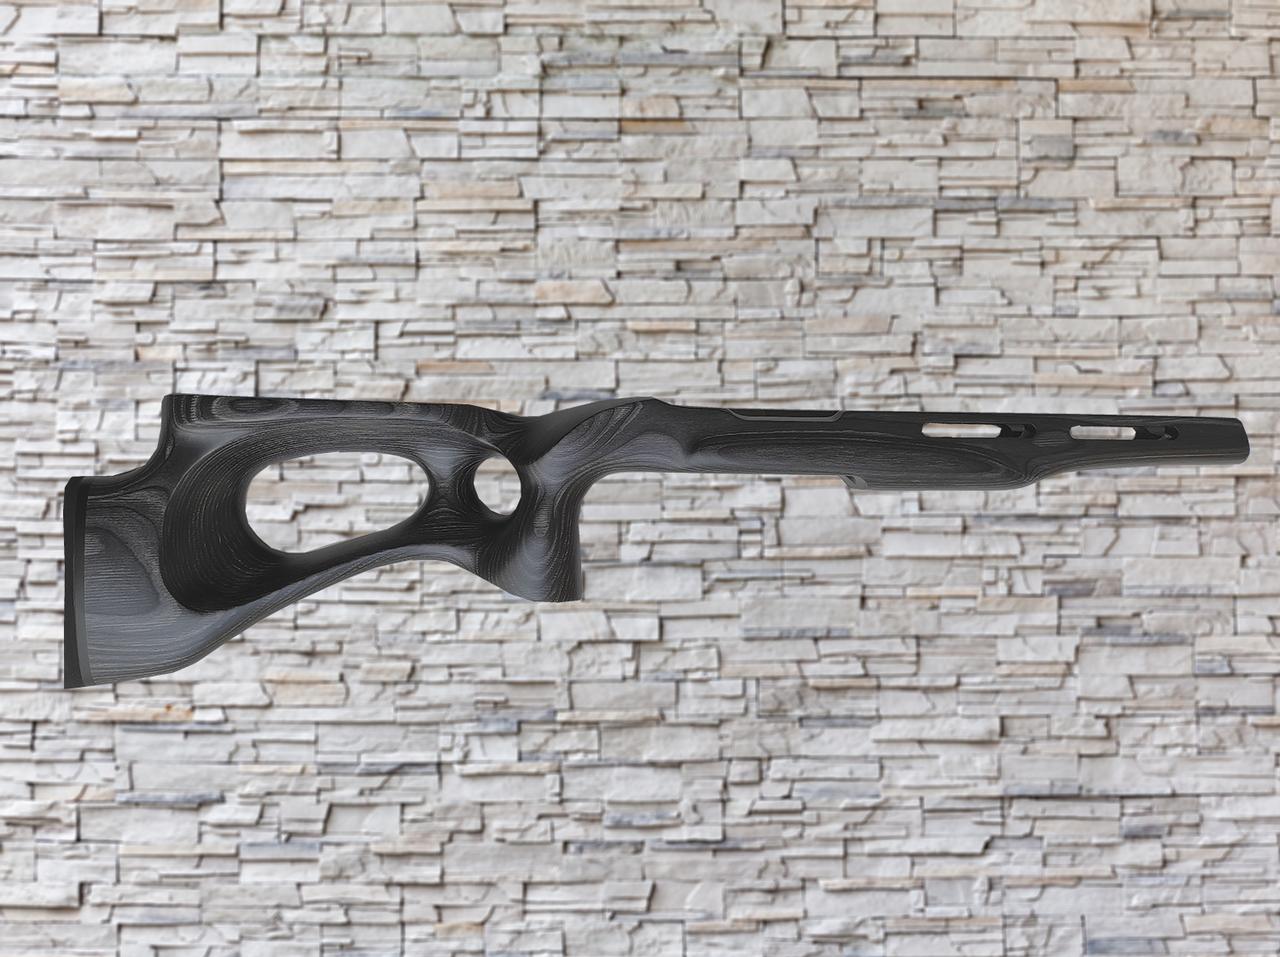 Revolution Extreme Bone Gray Stock Ruger 10/22, T/CR22 Bull Barrel Rifle